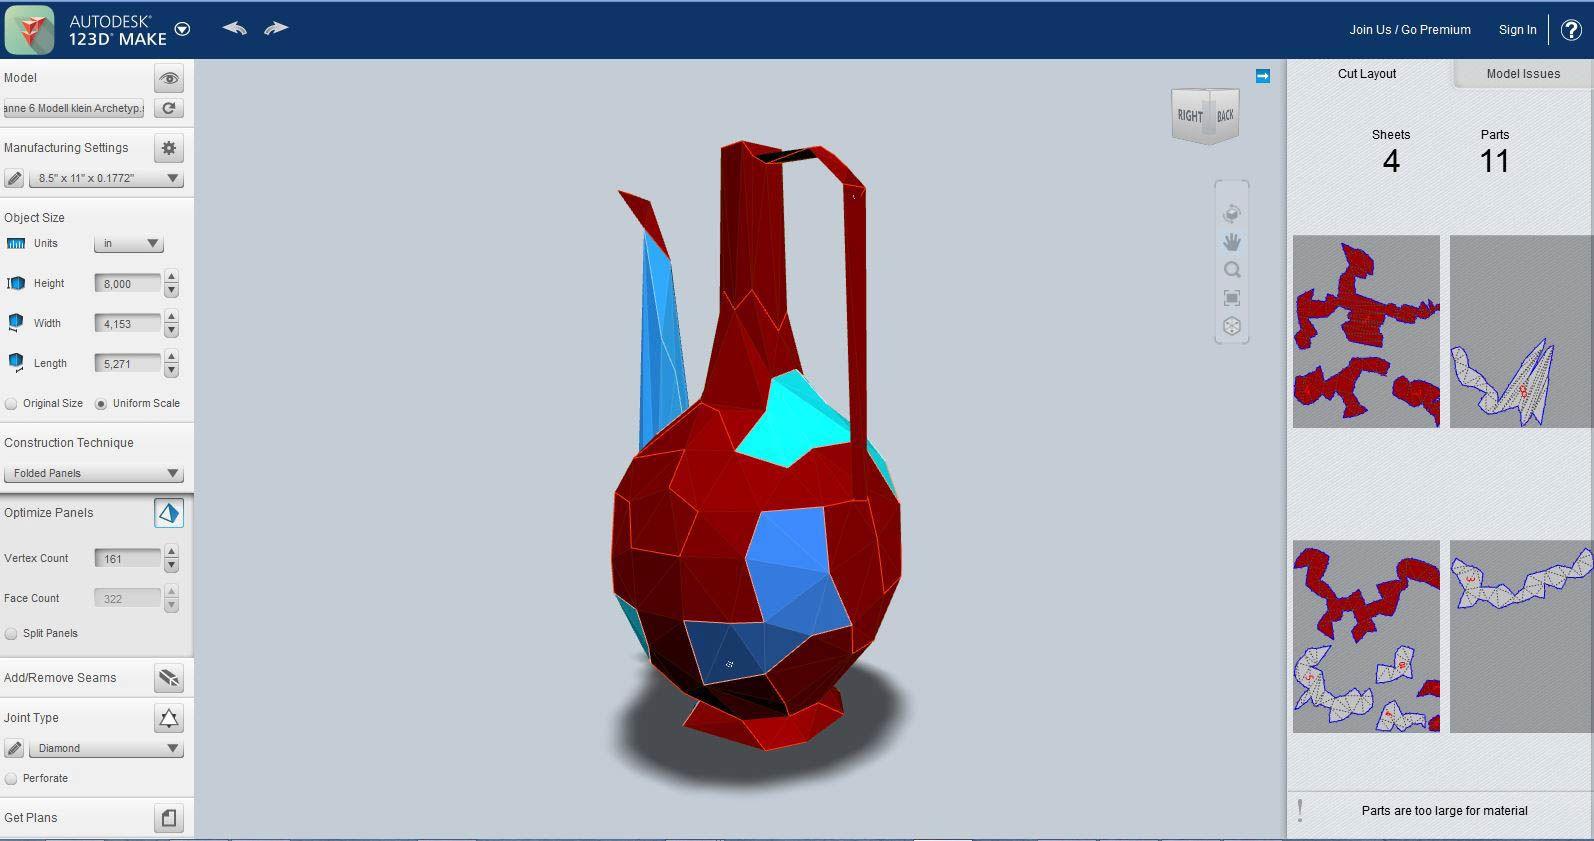 Autodesk modeling